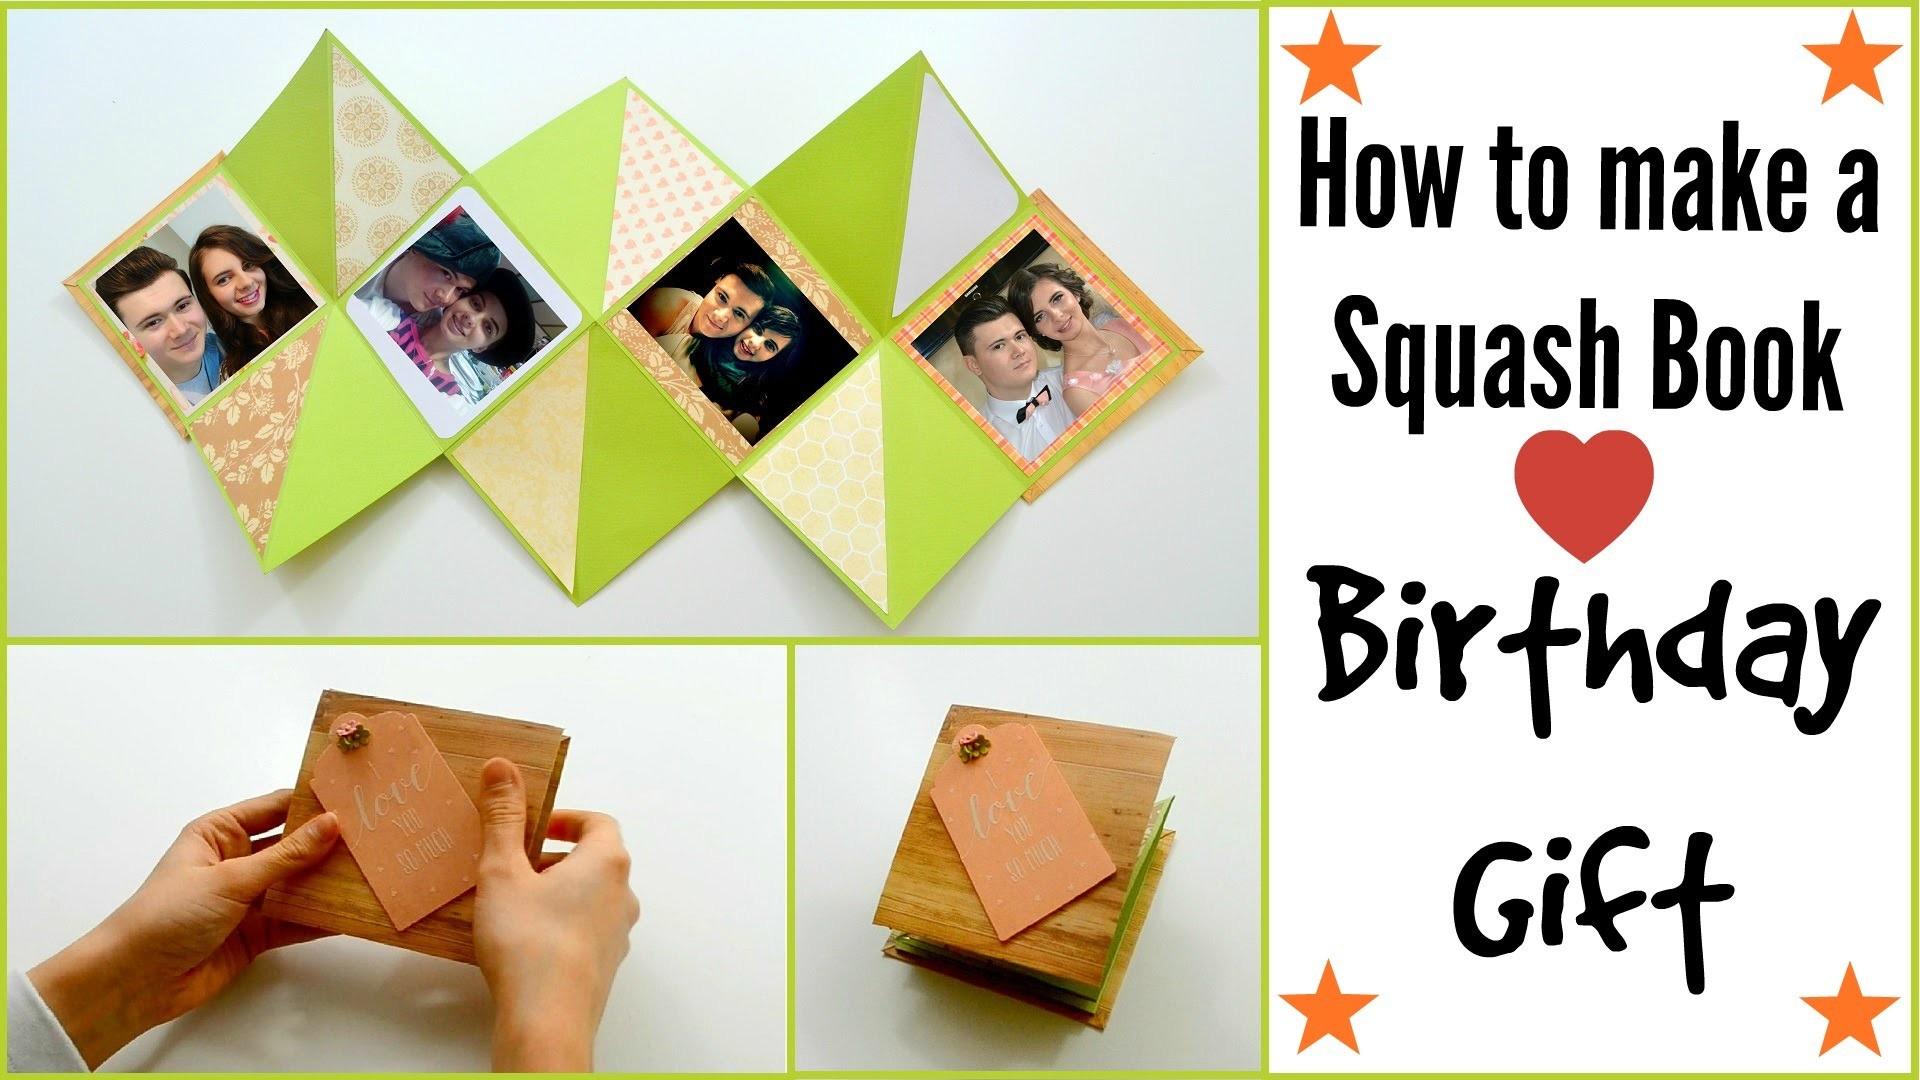 Diy Paper Crafts How To Make A Squash Card Squash Book